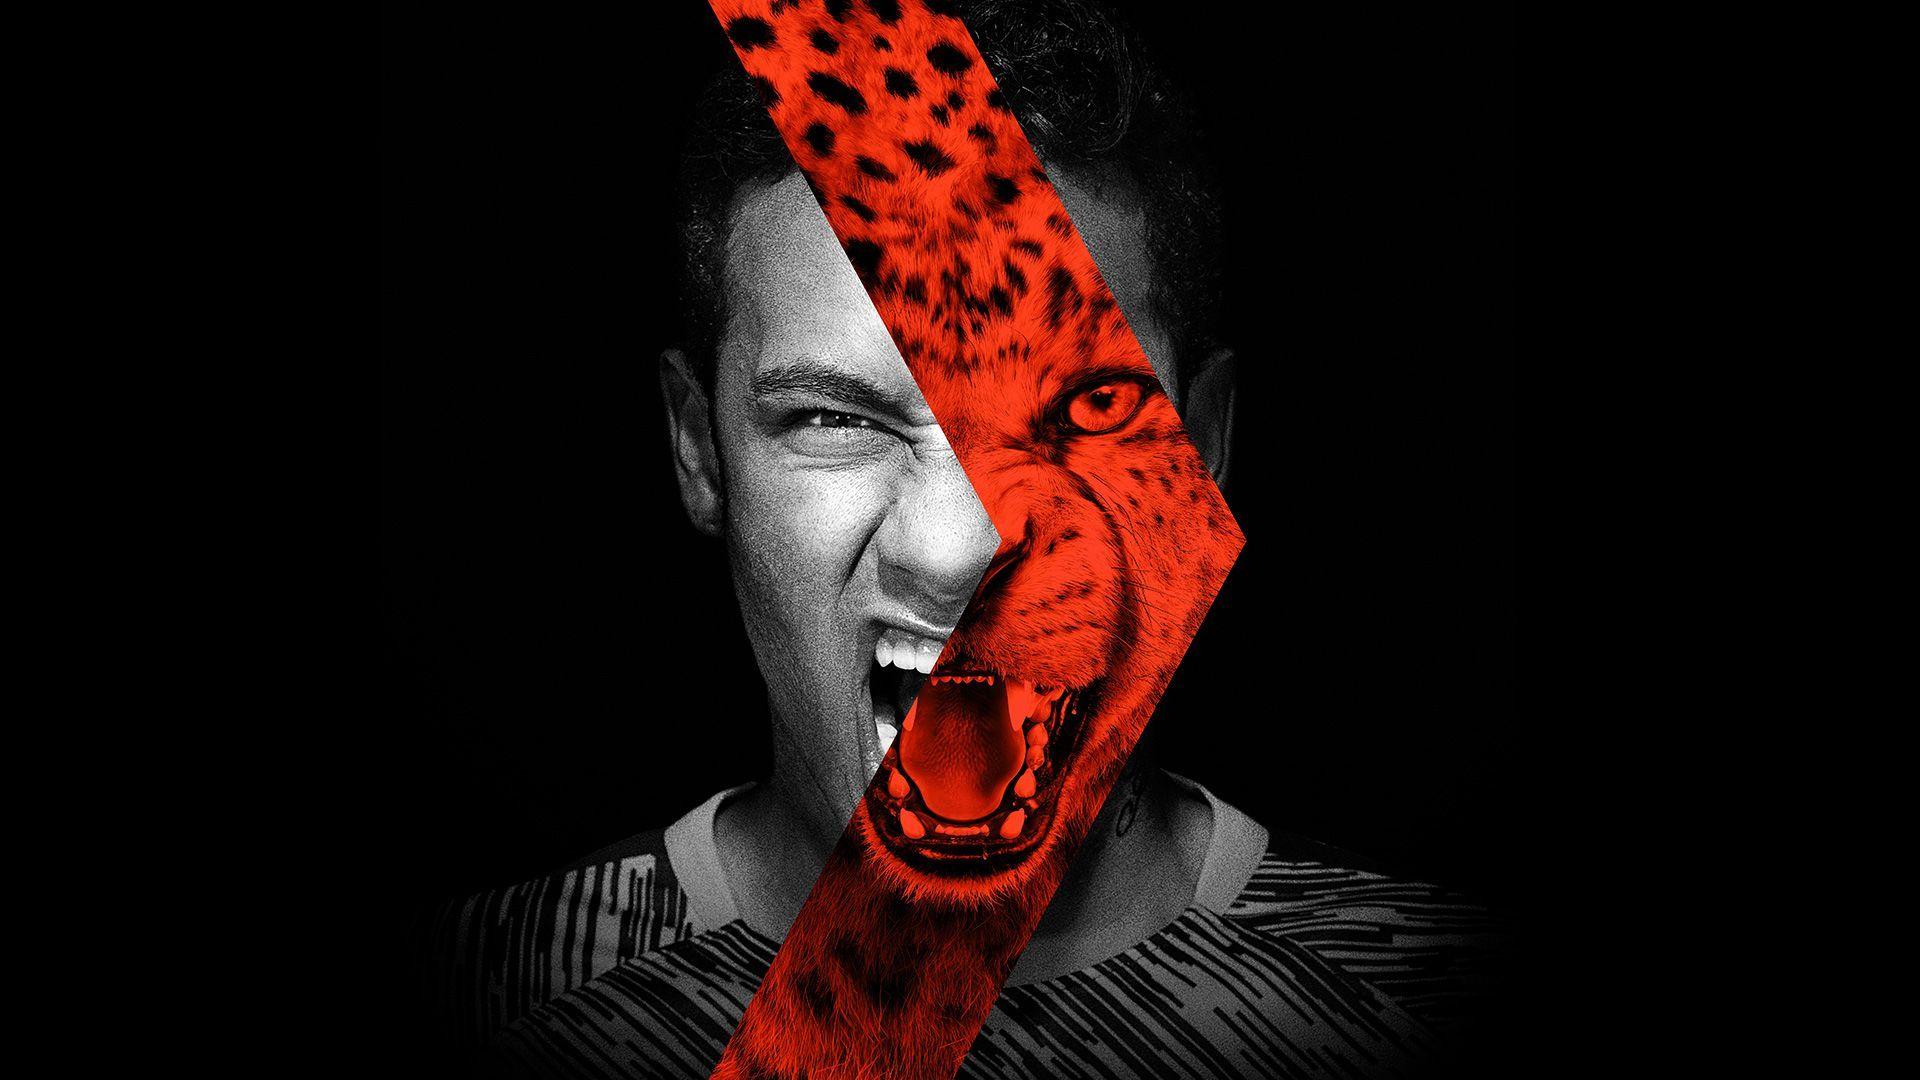 testimonianza fantasioso persuasivo  Image result for nike mercurial tiger face edit